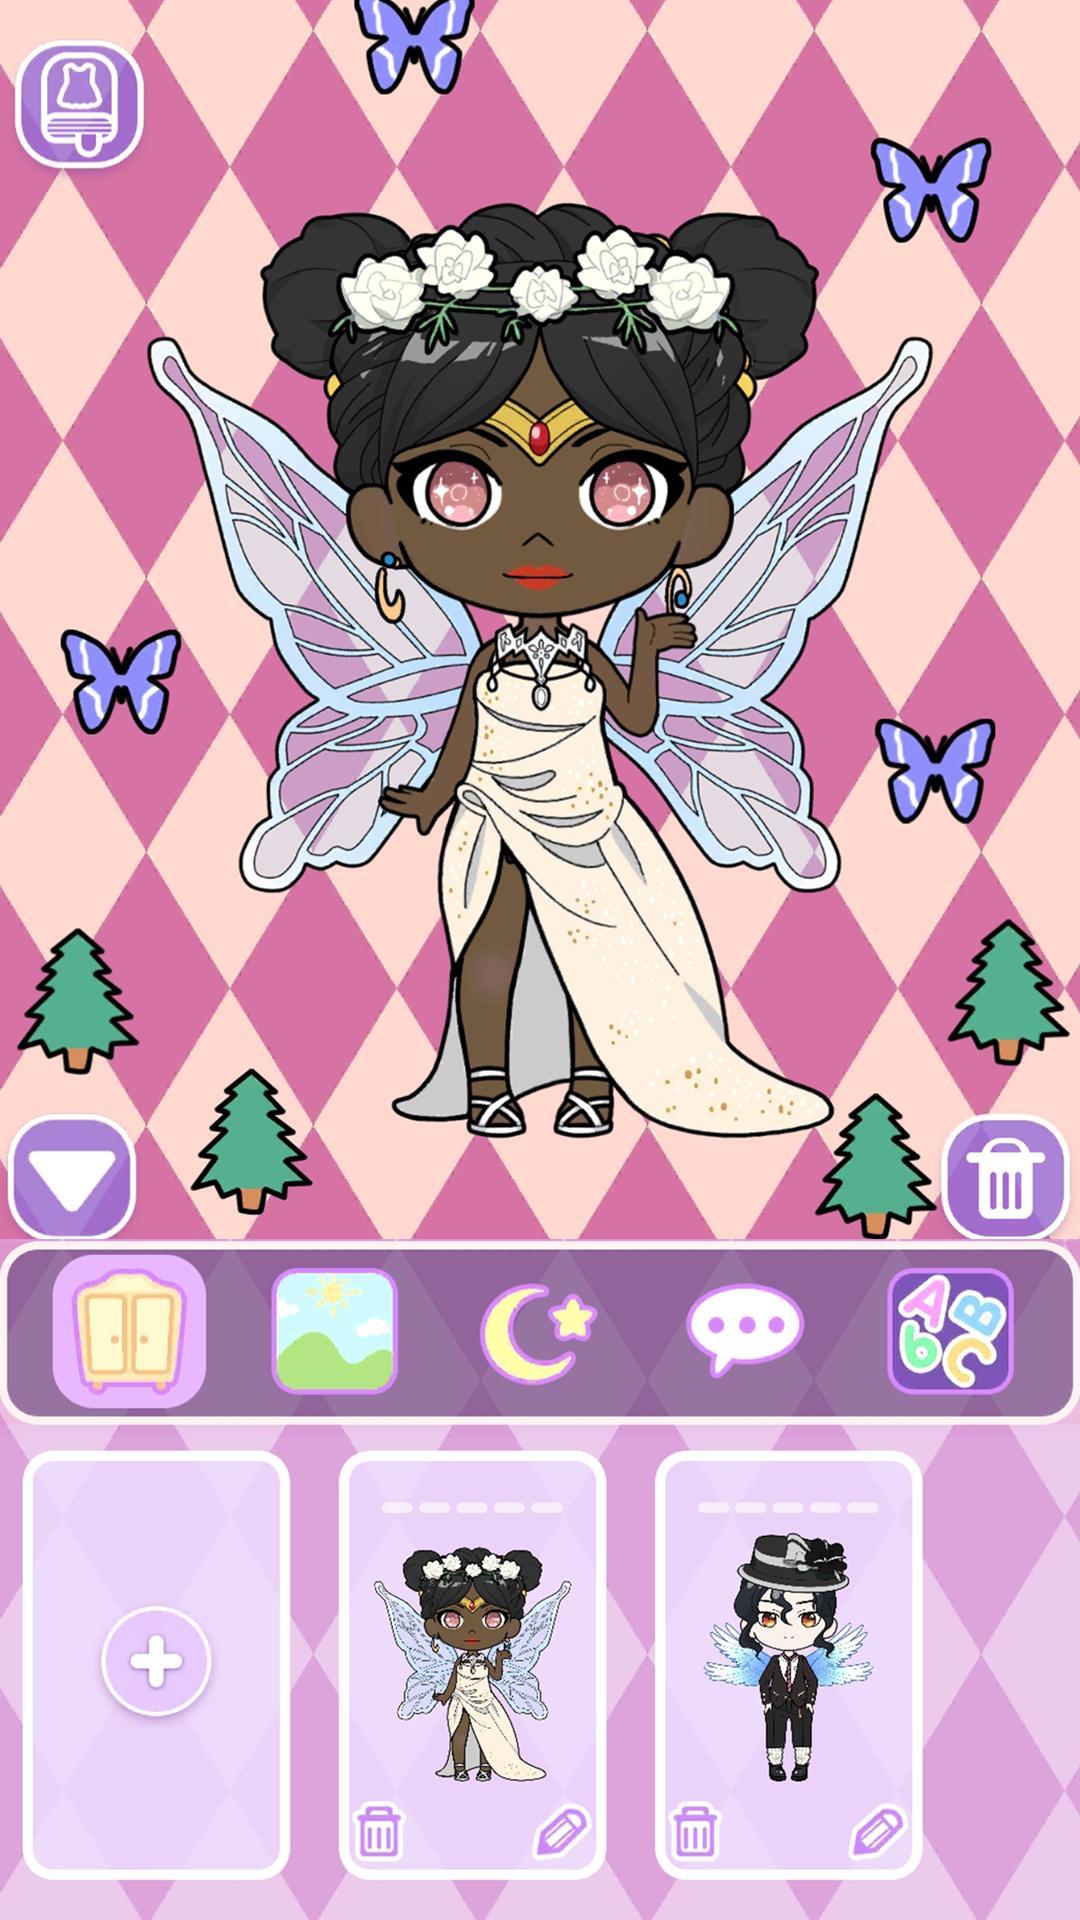 Vlinder Doll Dress up Games , Avatar Creator 1.2.1 Screenshot 4